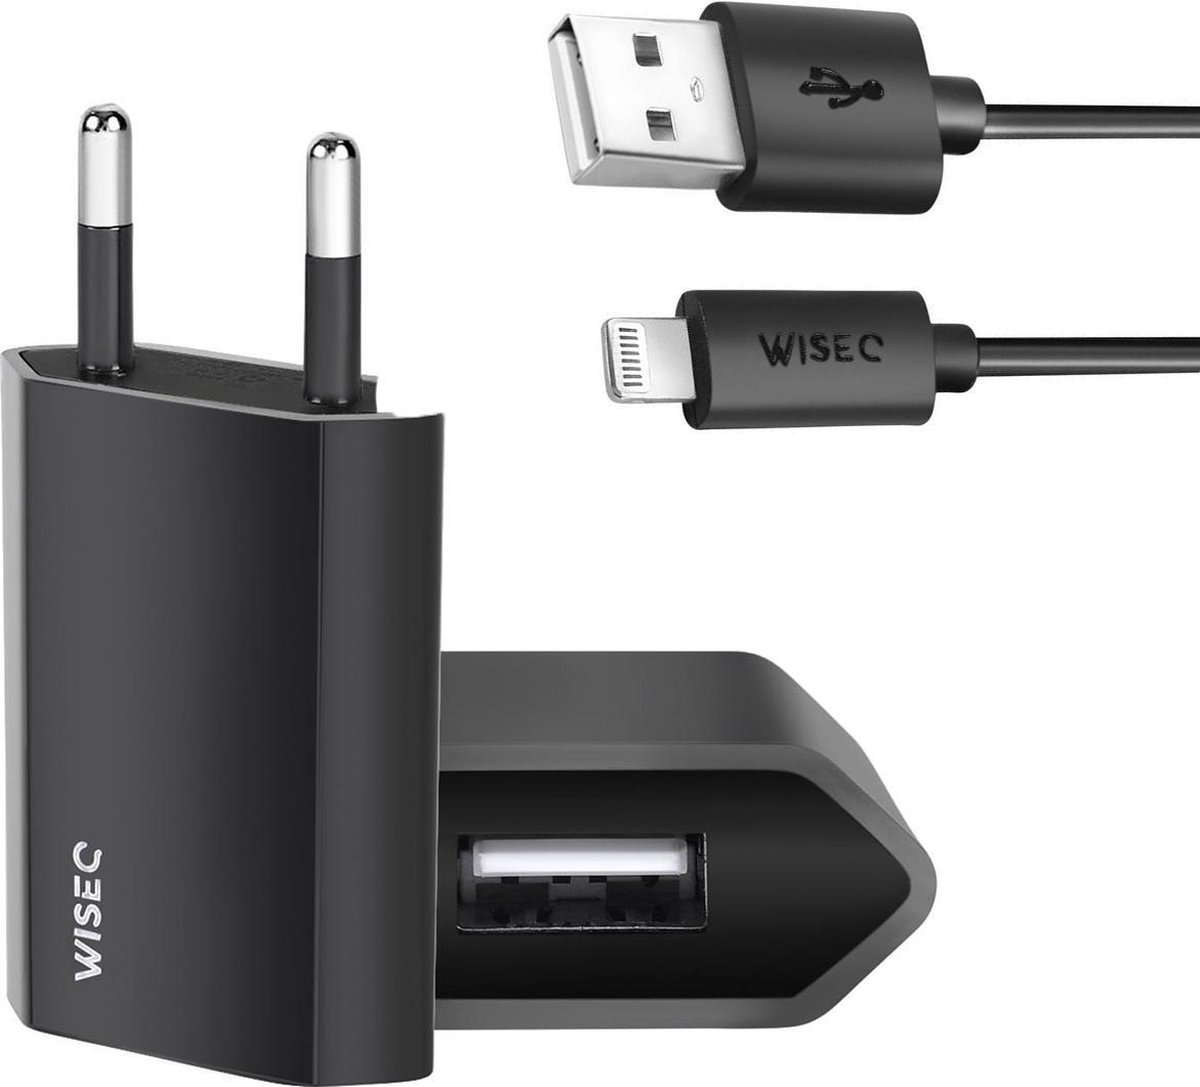 iPhone oplader zwart - Inclusief USB naar Apple Lightning Kabel - 1 Meter - 1A / 5W - Zwart